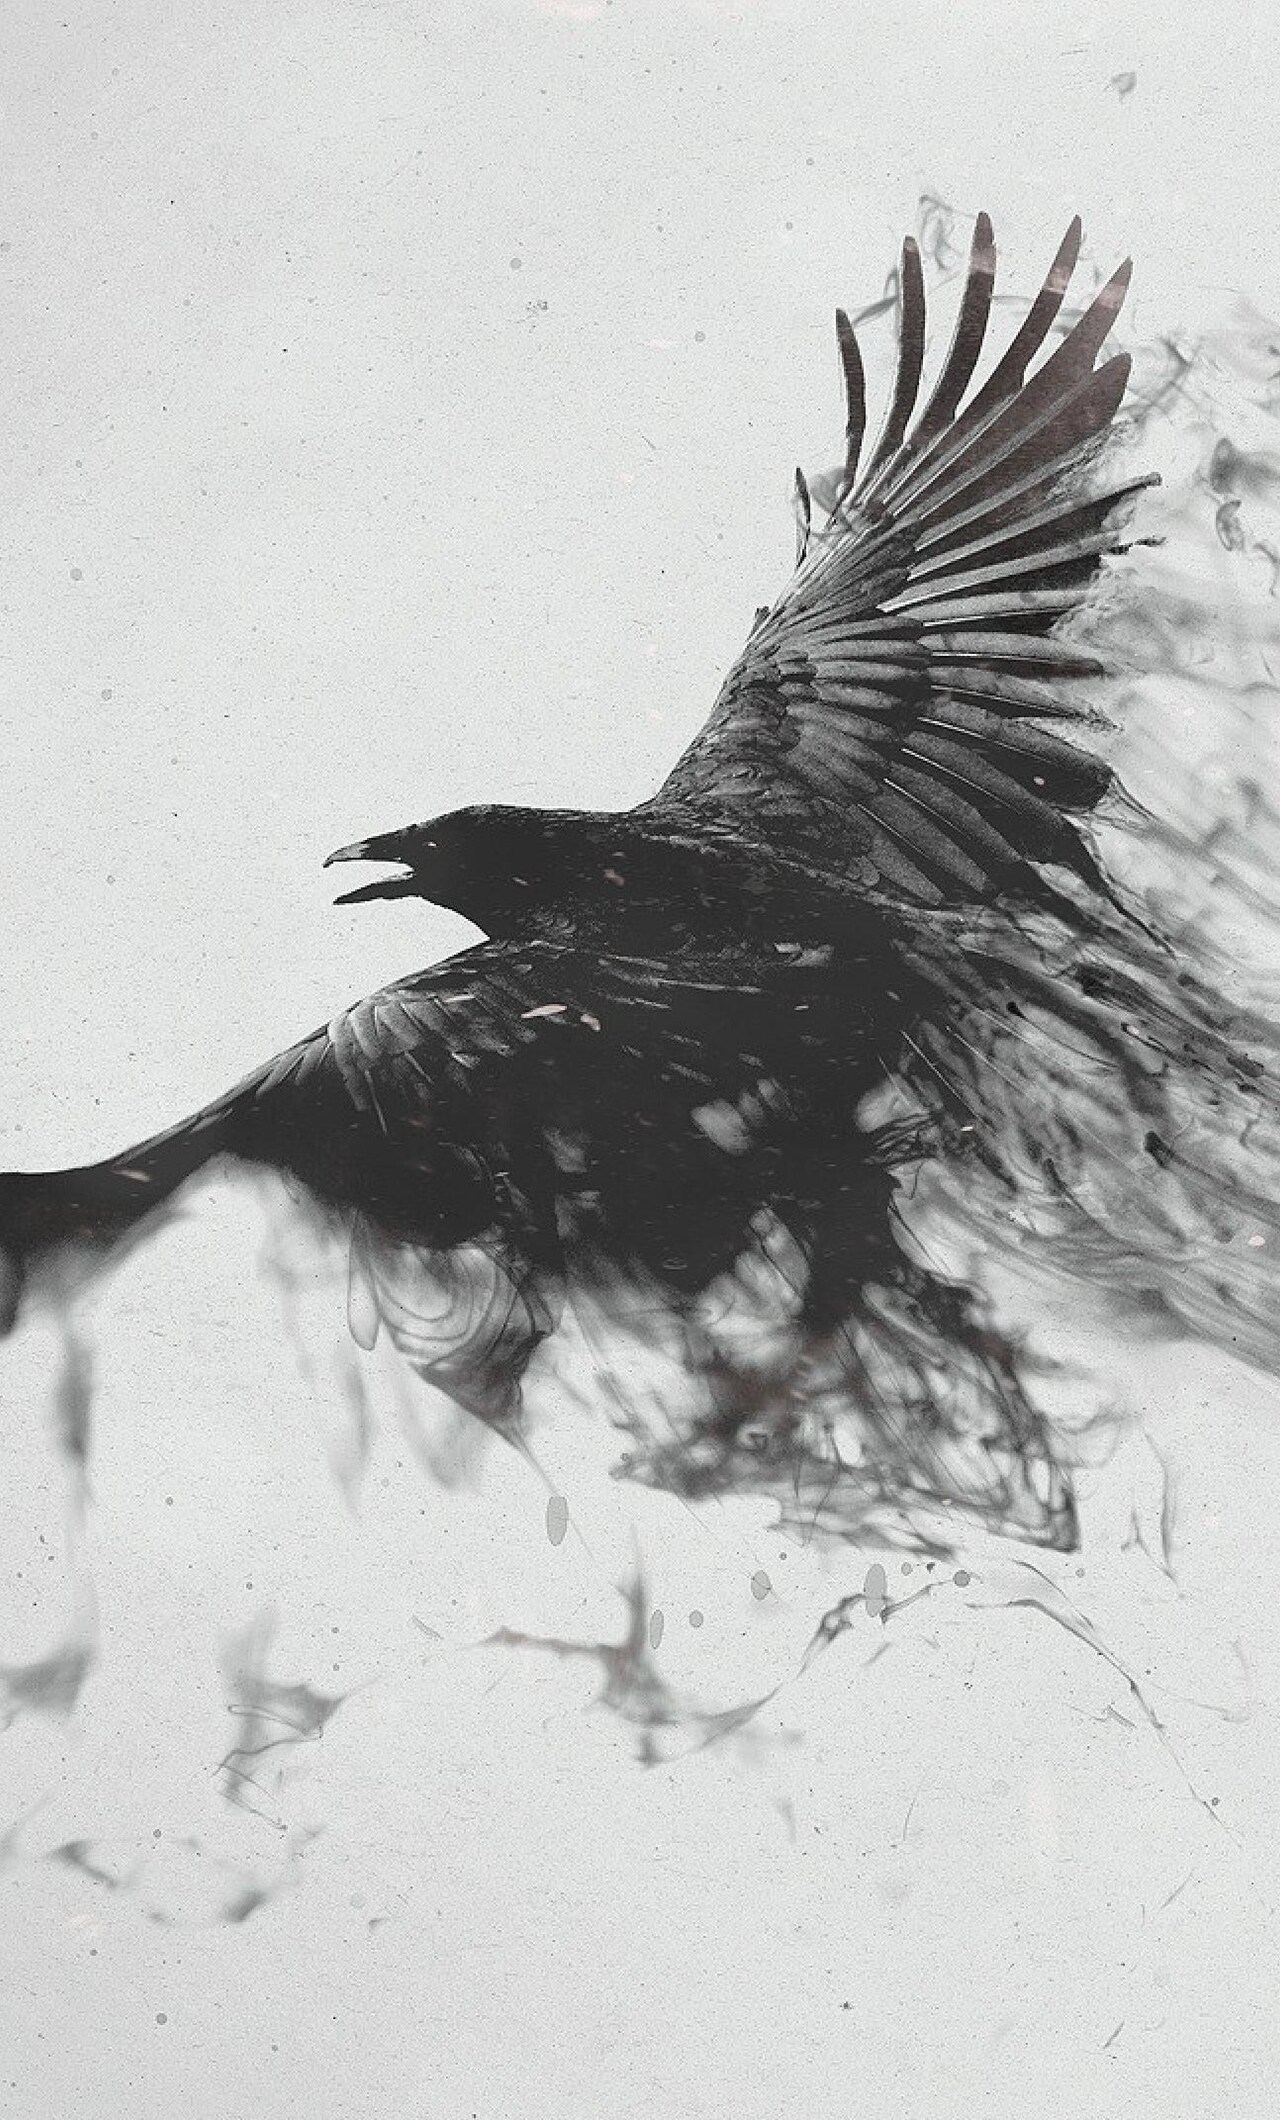 1280x2120 Raven Bird Art IPhone 6 HD 4k Wallpapers Images